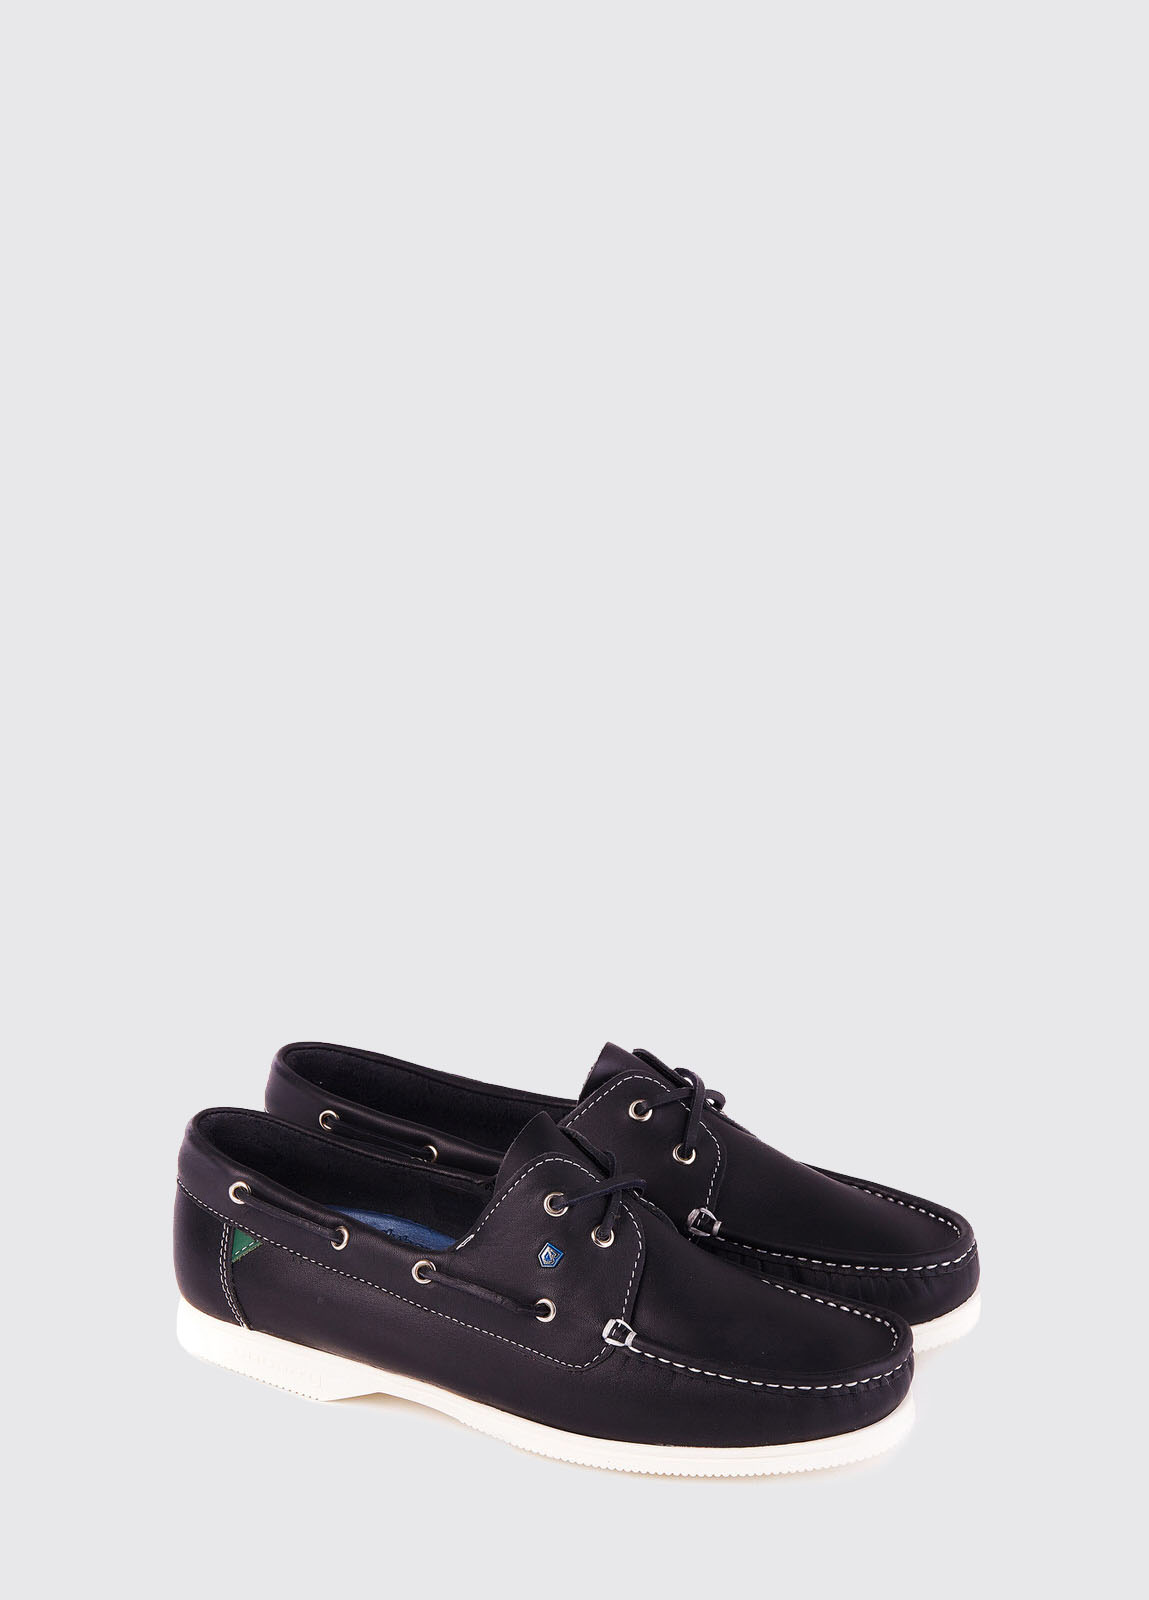 Admirals Deck Shoe - Navy